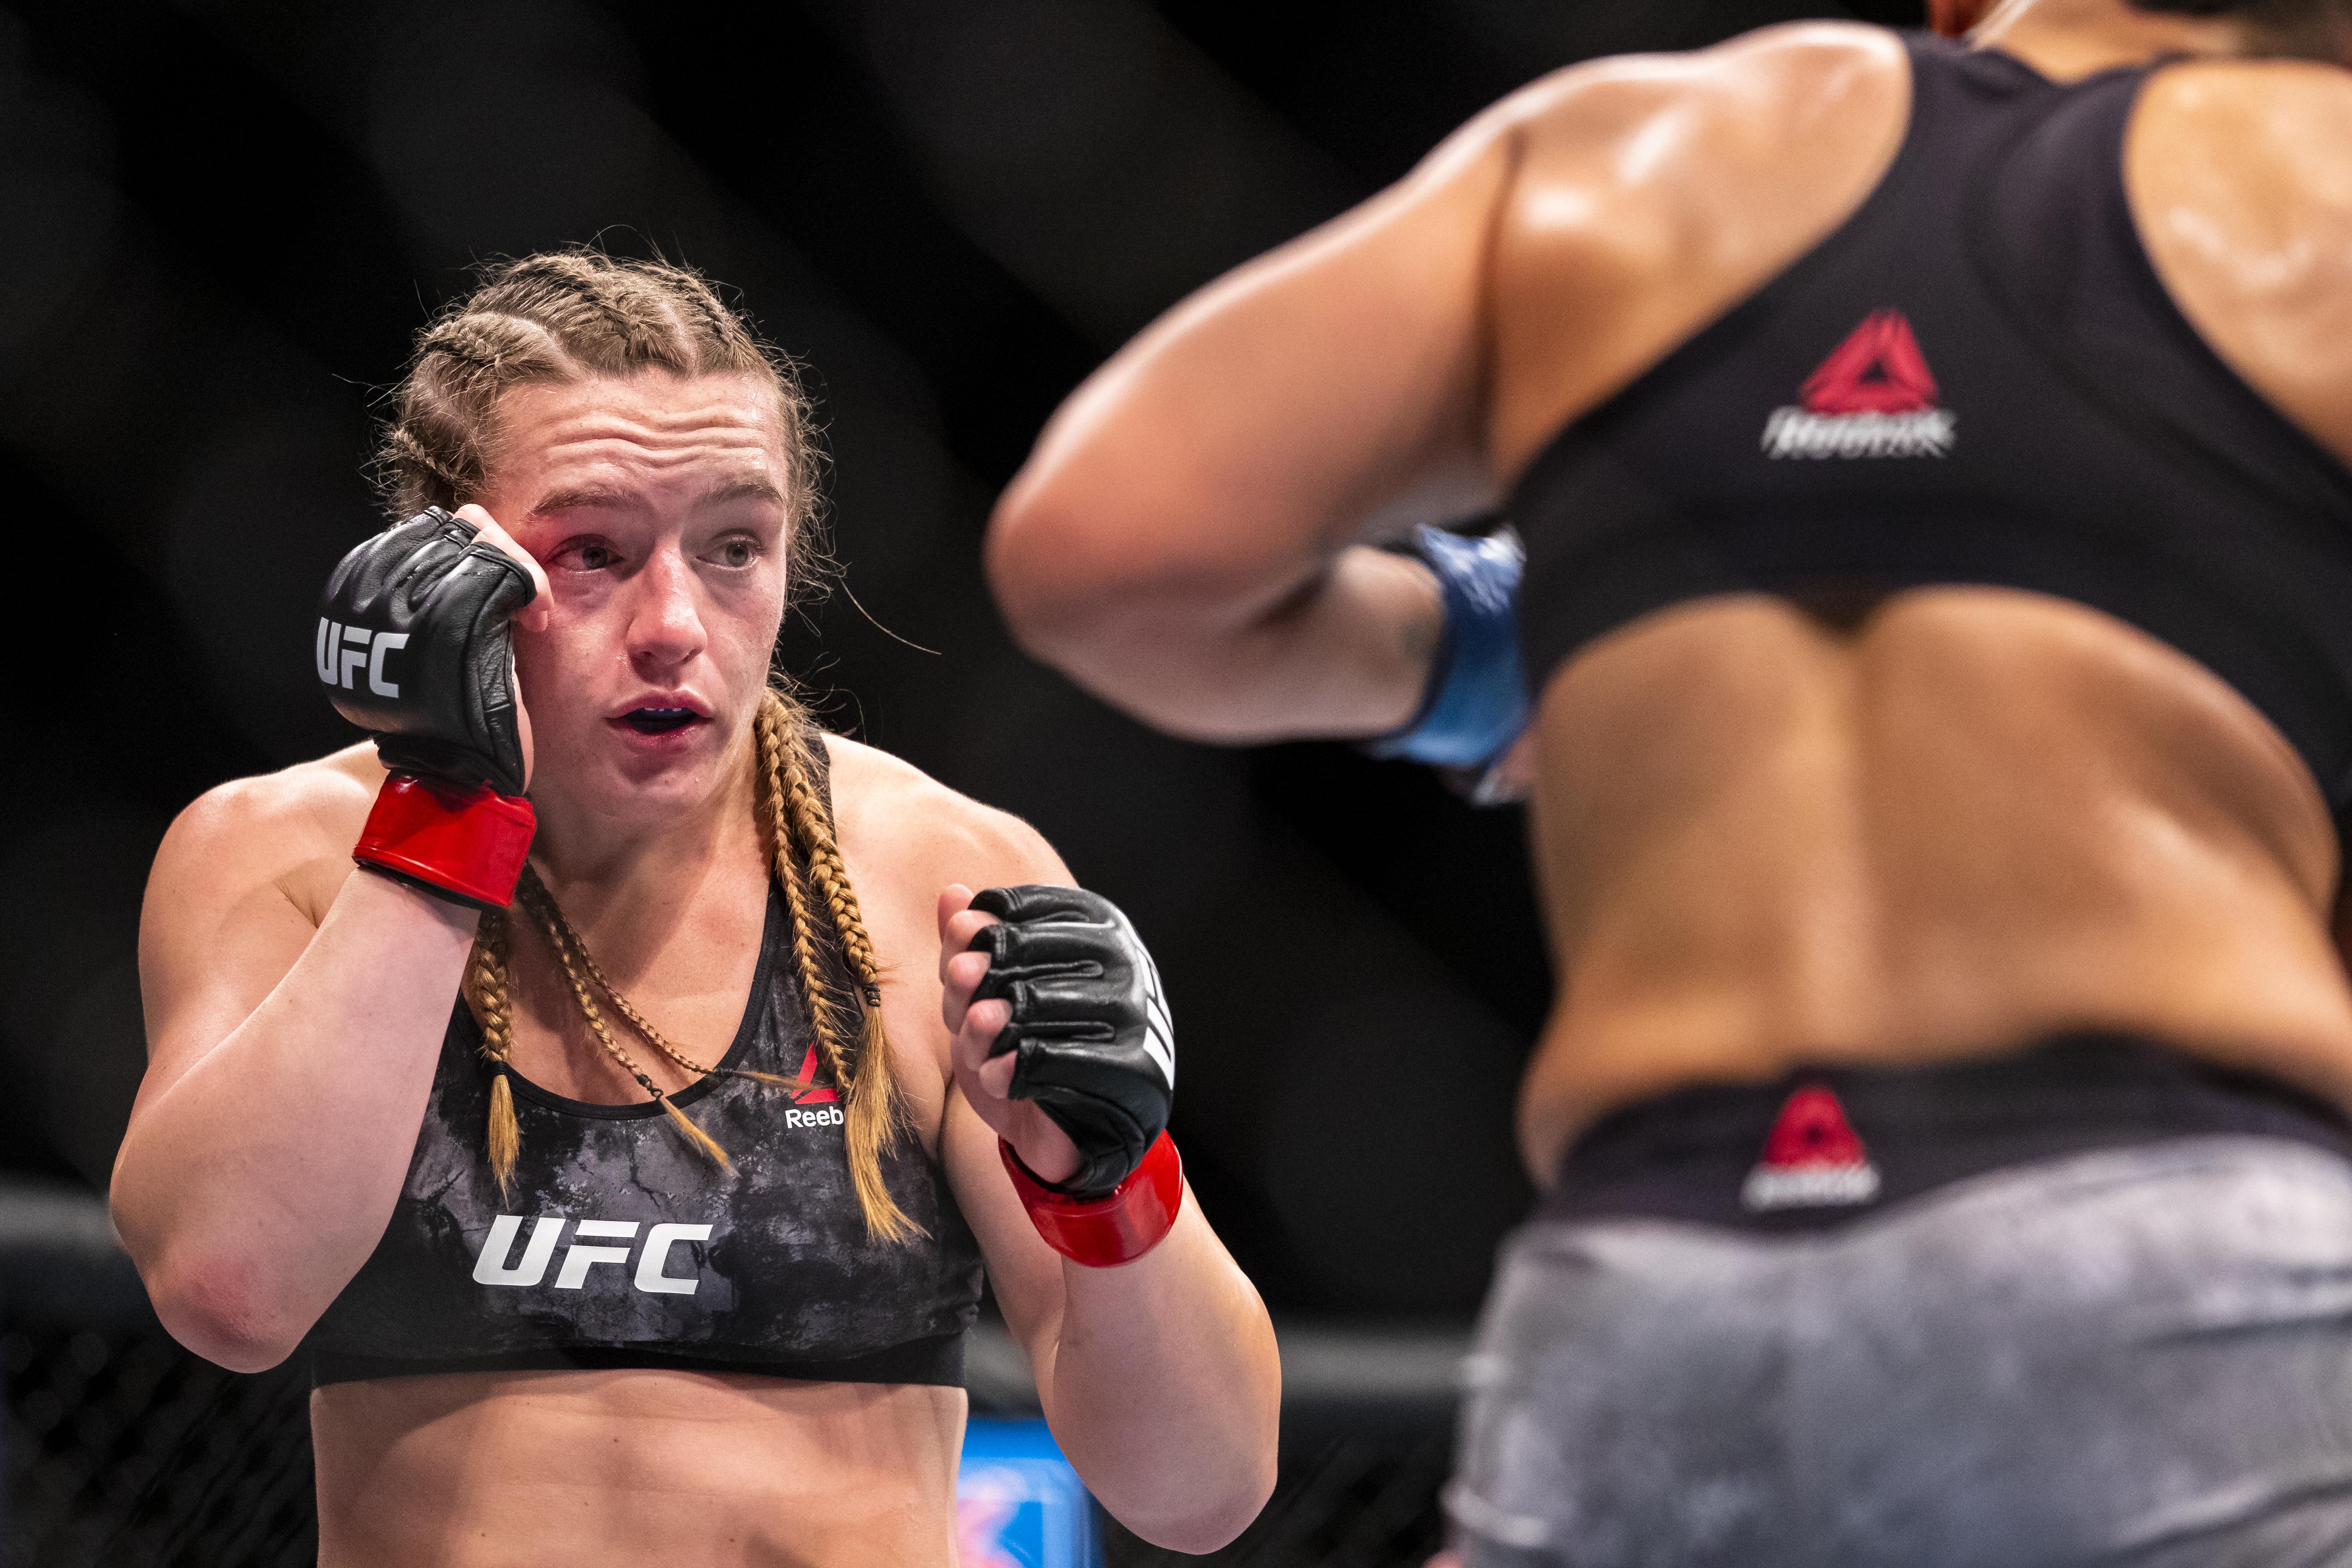 How to watch UFC Fight Night 155: 'de Randamie vs  Ladd' TONIGHT on